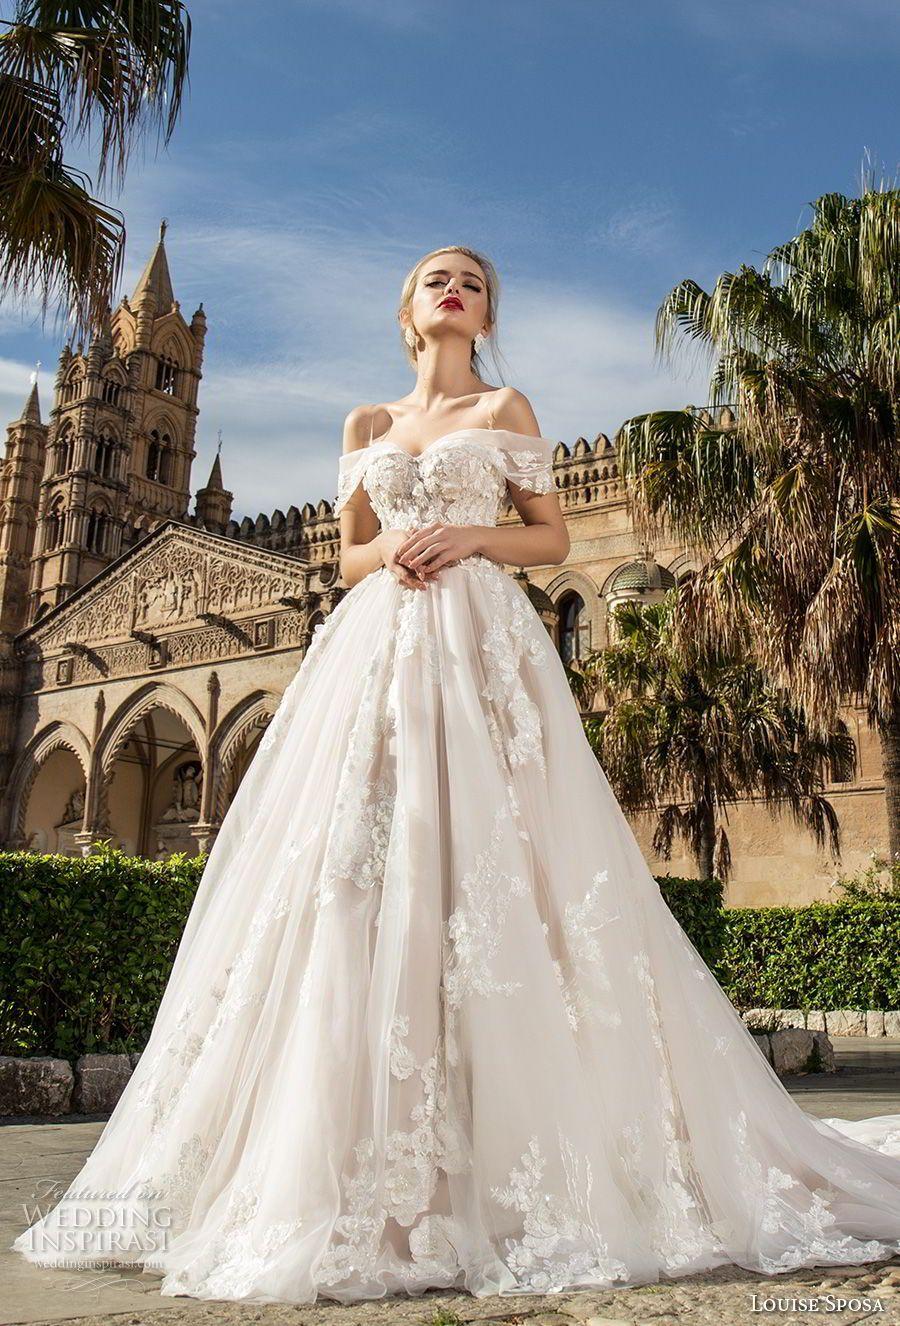 Louise sposa bridal off the shoulder sweetheart neckline